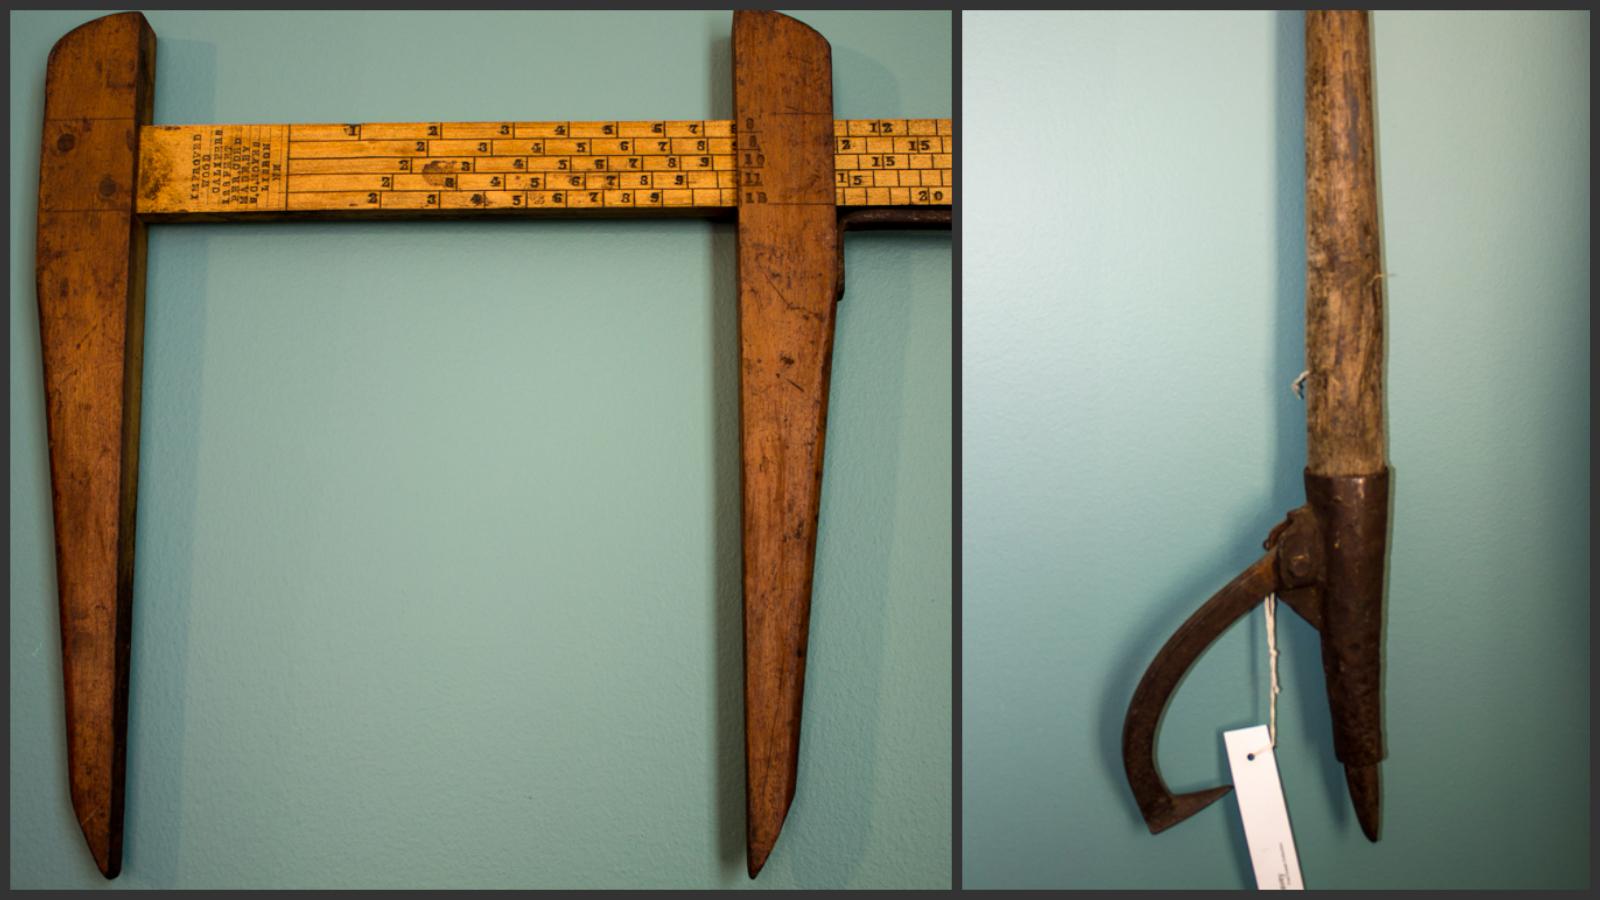 19th Century Logging Tools: Log Rule & Peavey